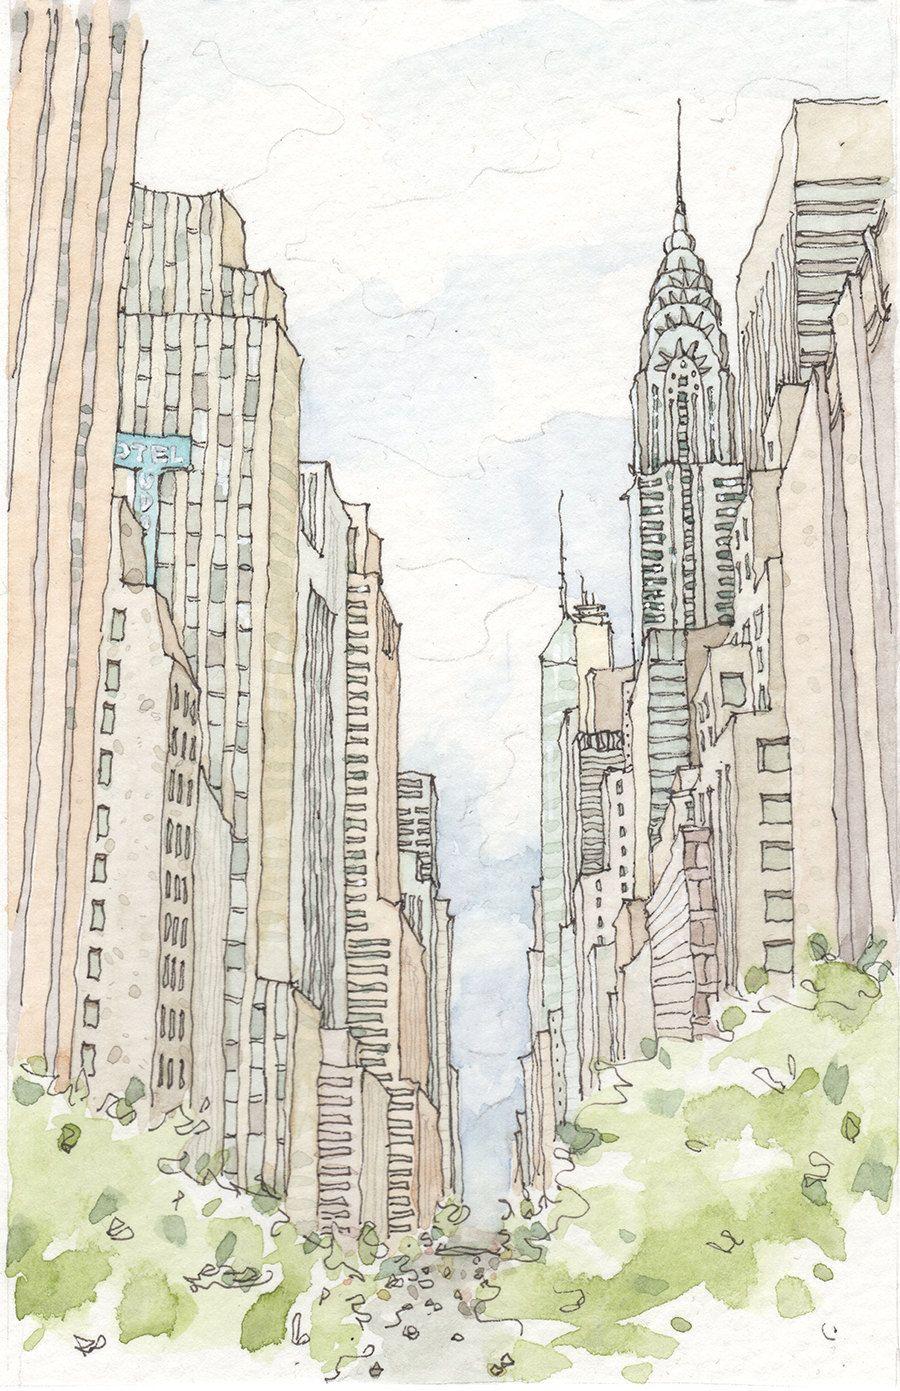 Nycinspiration Sketchdrawingsbyasketchgirl New York City